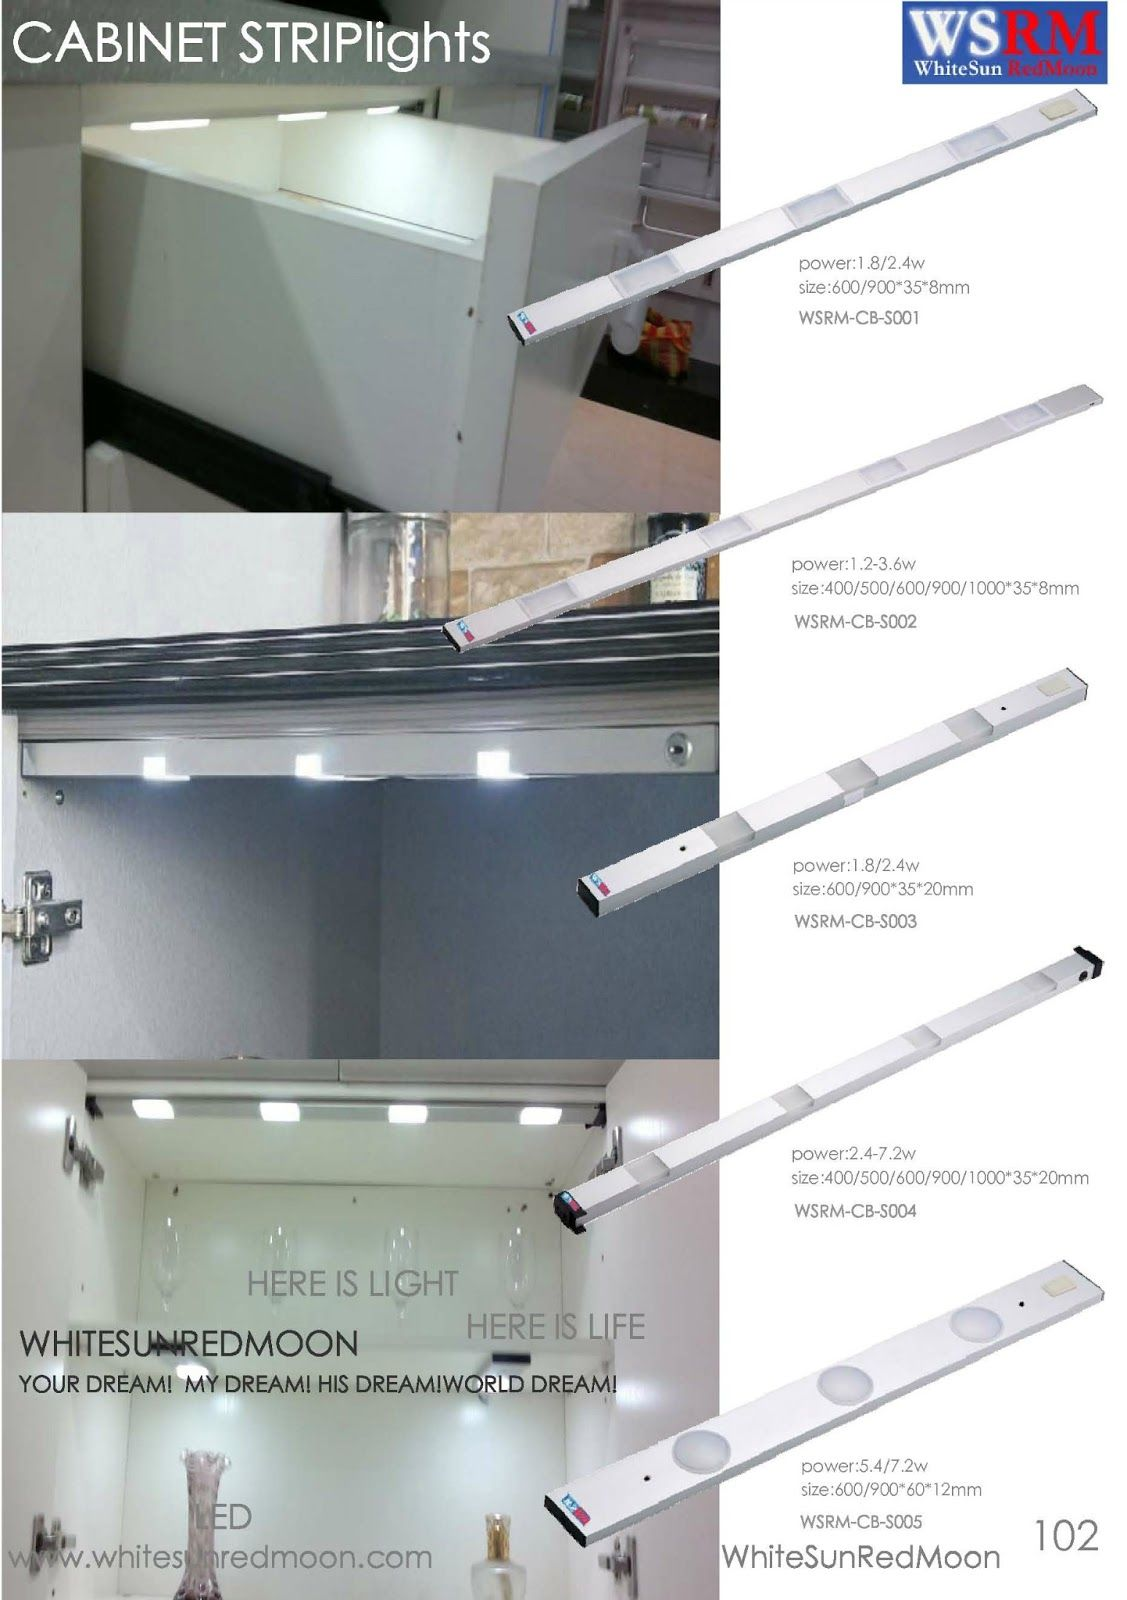 hard wiring under cabinet led lighting wiring under cabinet led lighting99 lighting